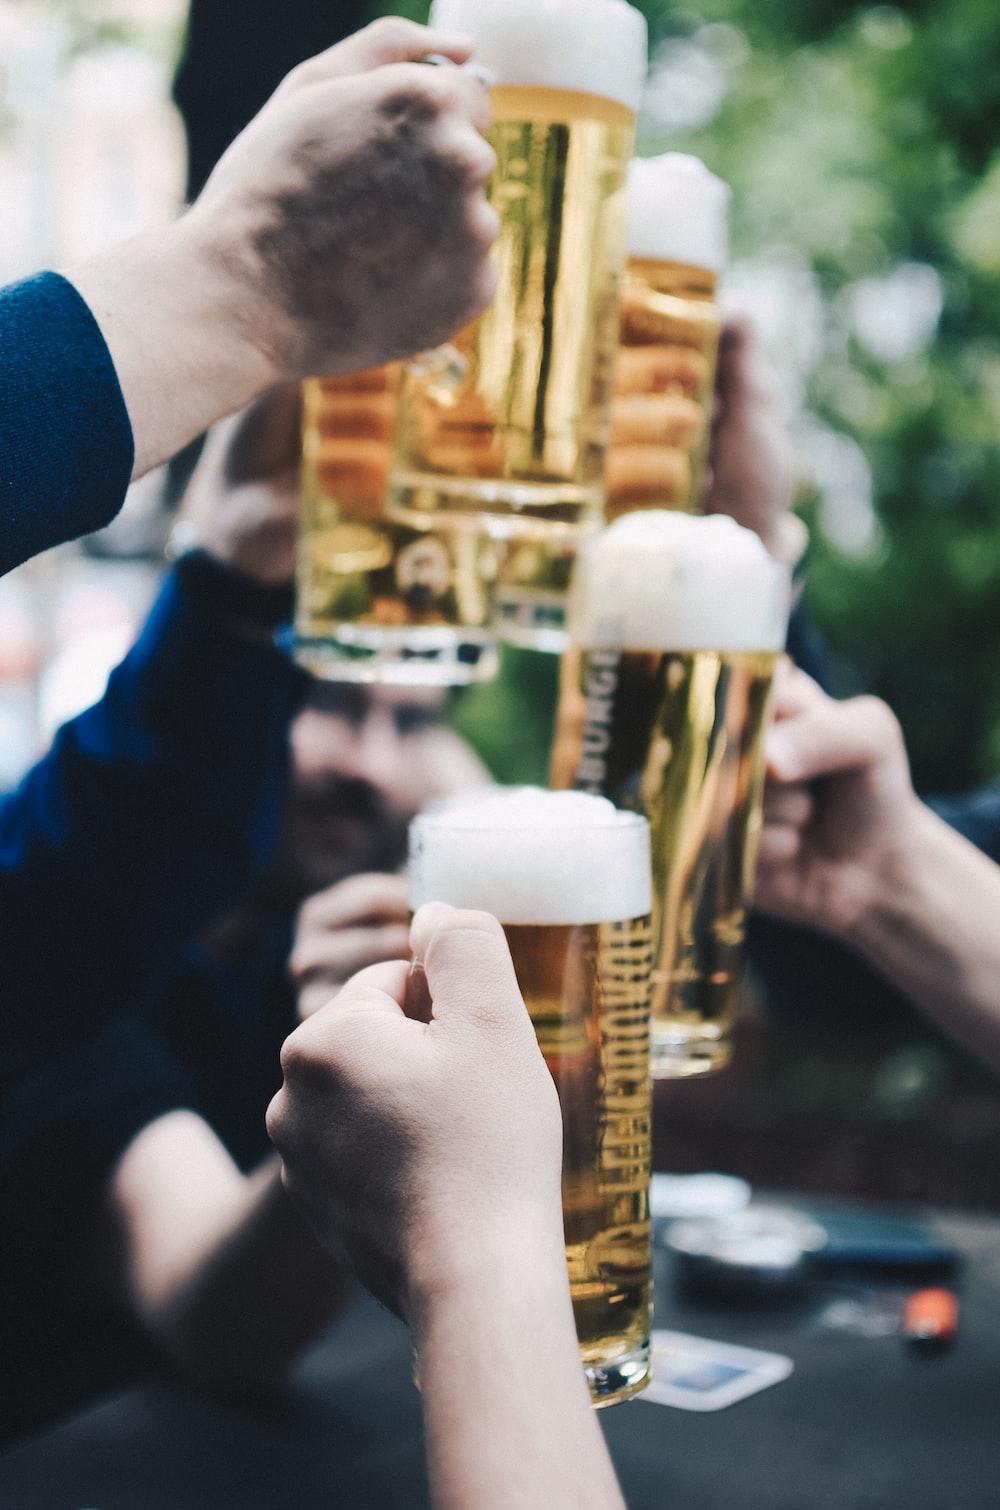 five beer mug filled with beer